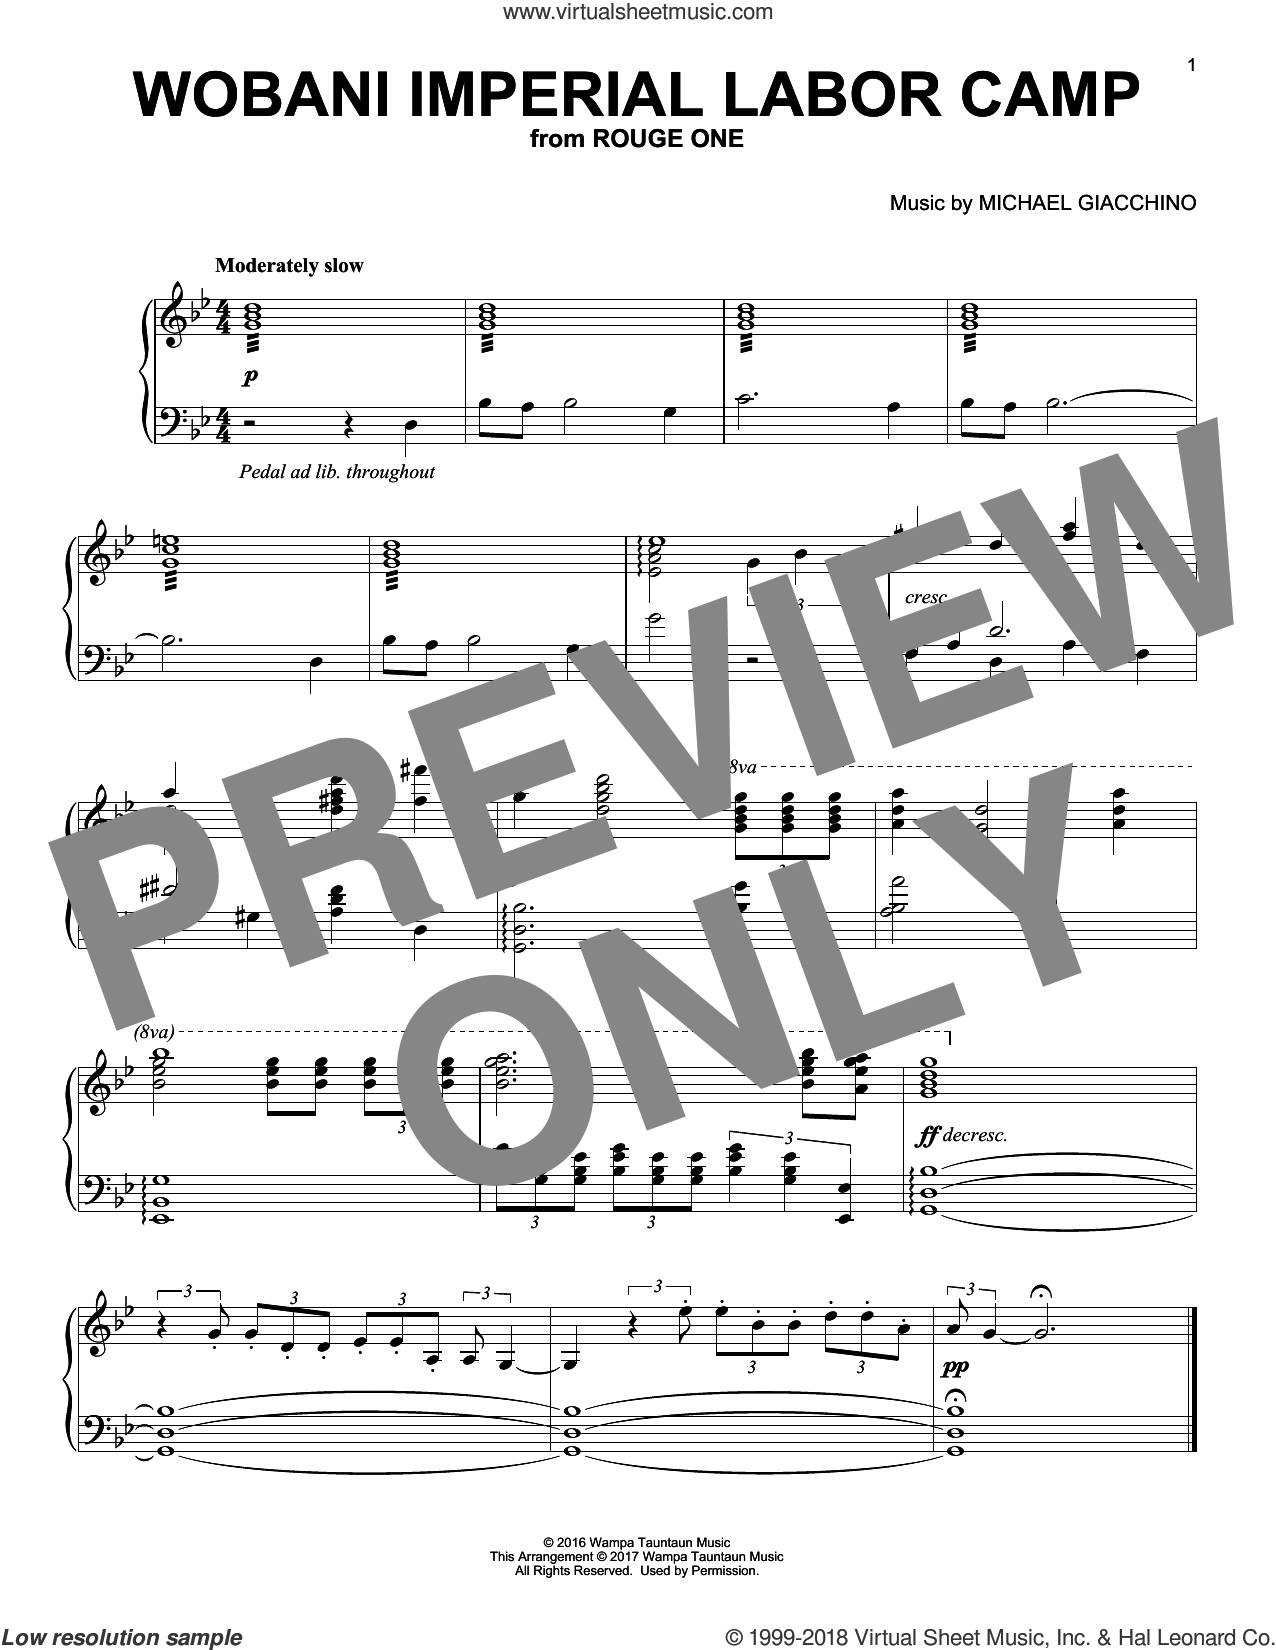 Wobani Imperial Labor Camp sheet music for piano solo by Michael Giacchino, classical score, intermediate skill level